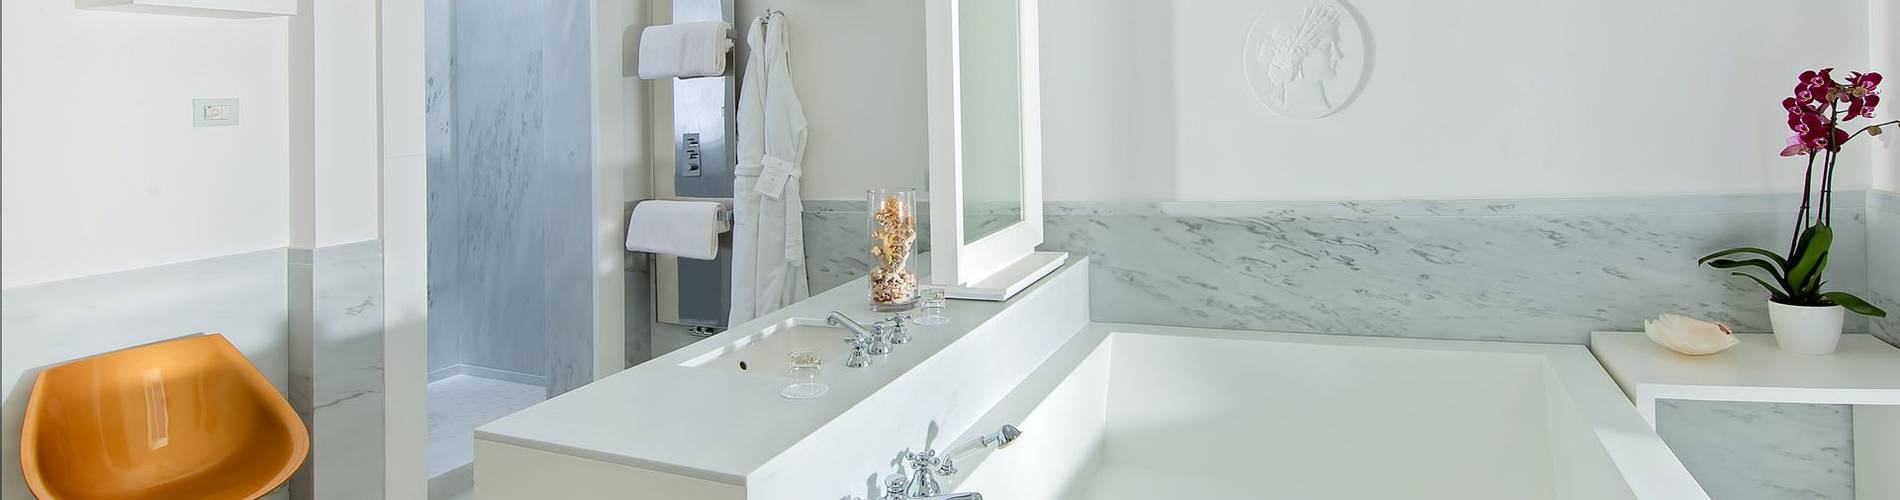 Bellevue Syrene, Sorrento, Italy, Lady Hamilton Suite (5).jpg